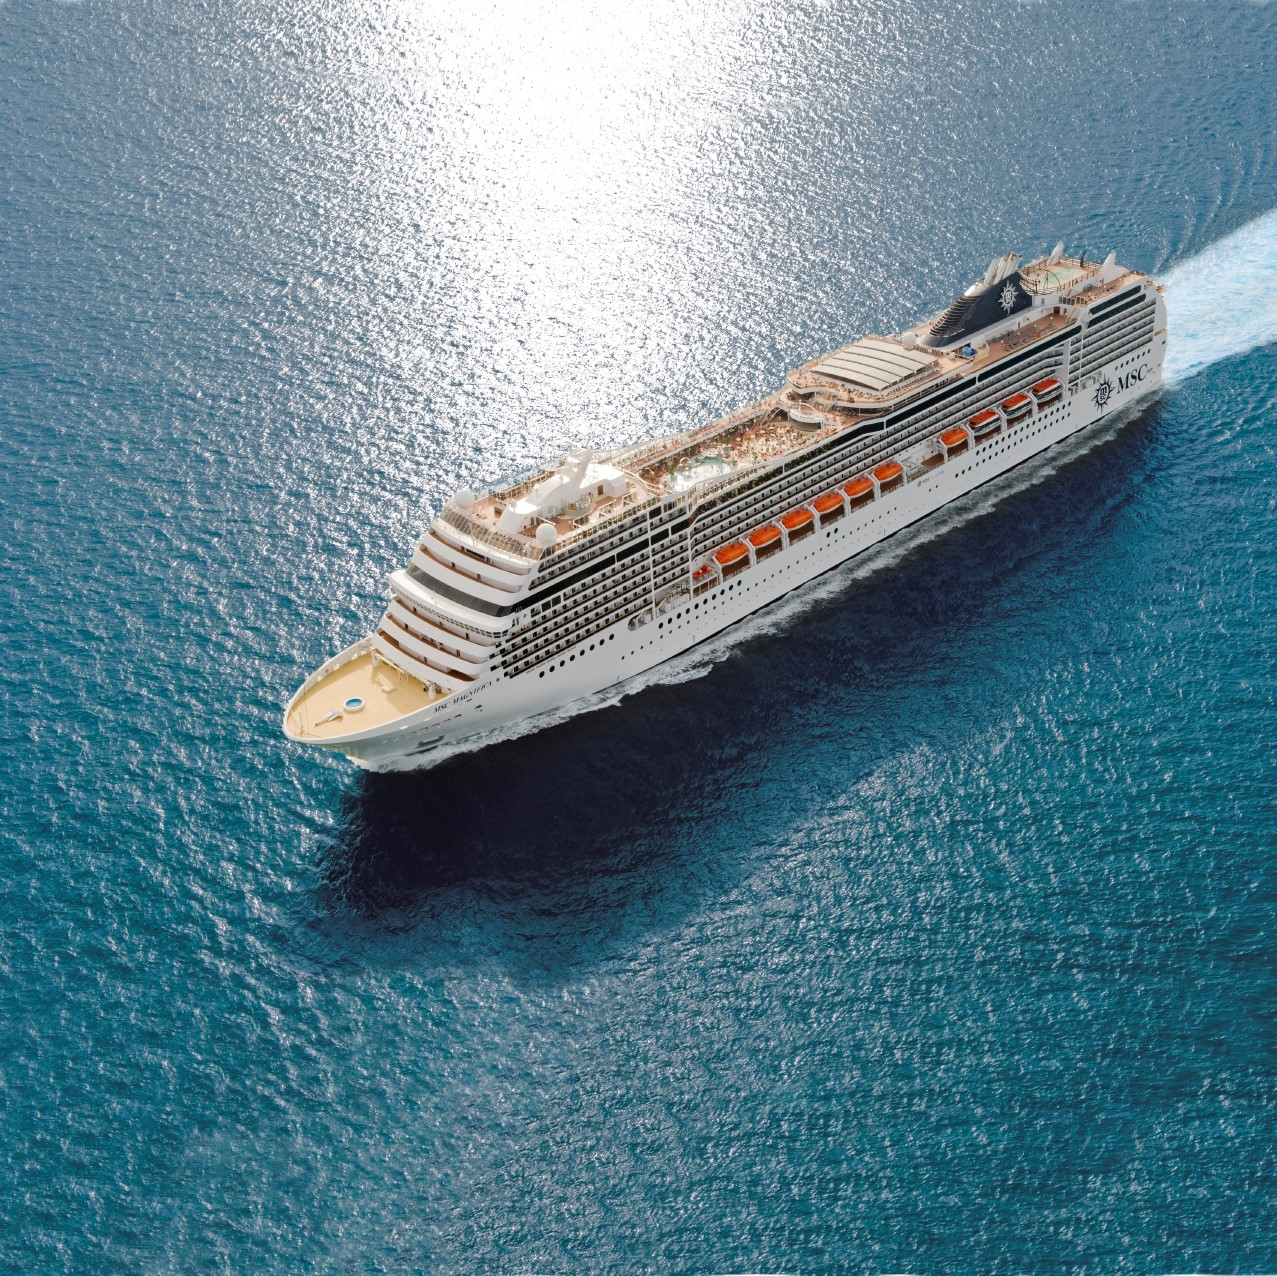 MSC邮轮:116天环球邮轮航线探索新世界